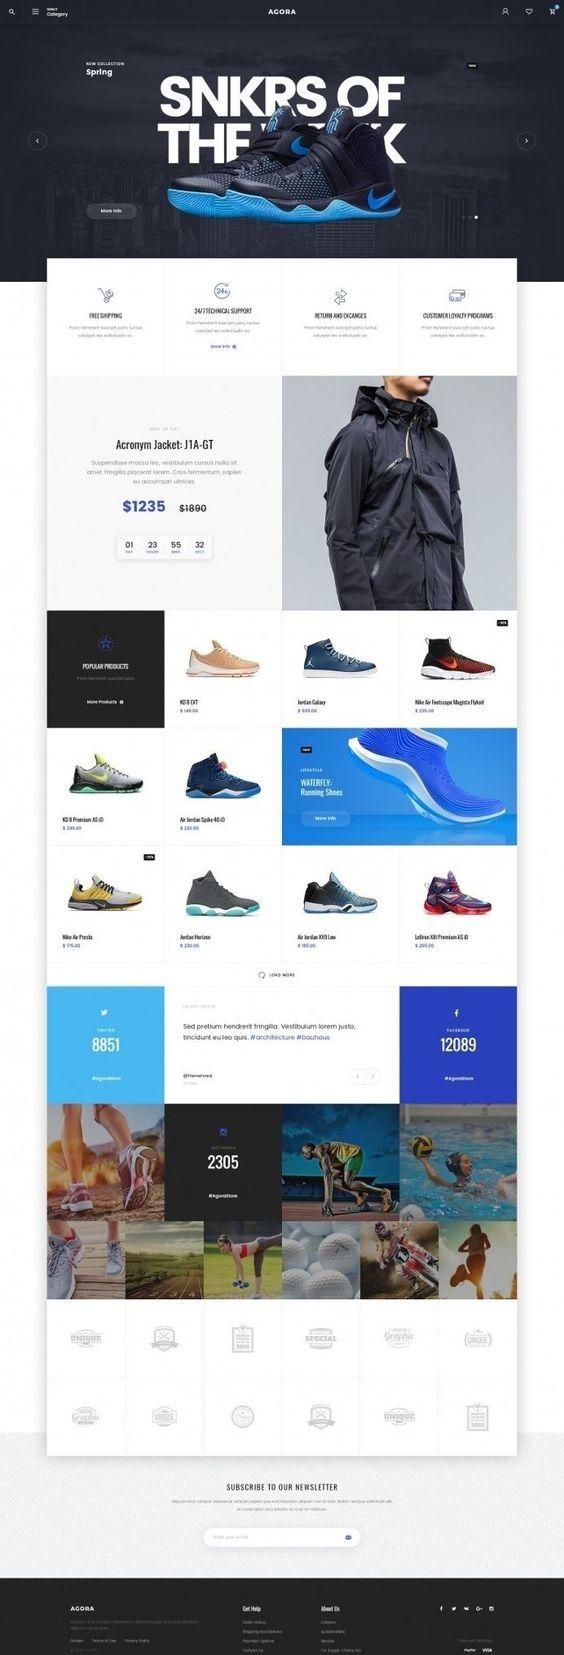 best WordPress theme for e-commerce getwebinc